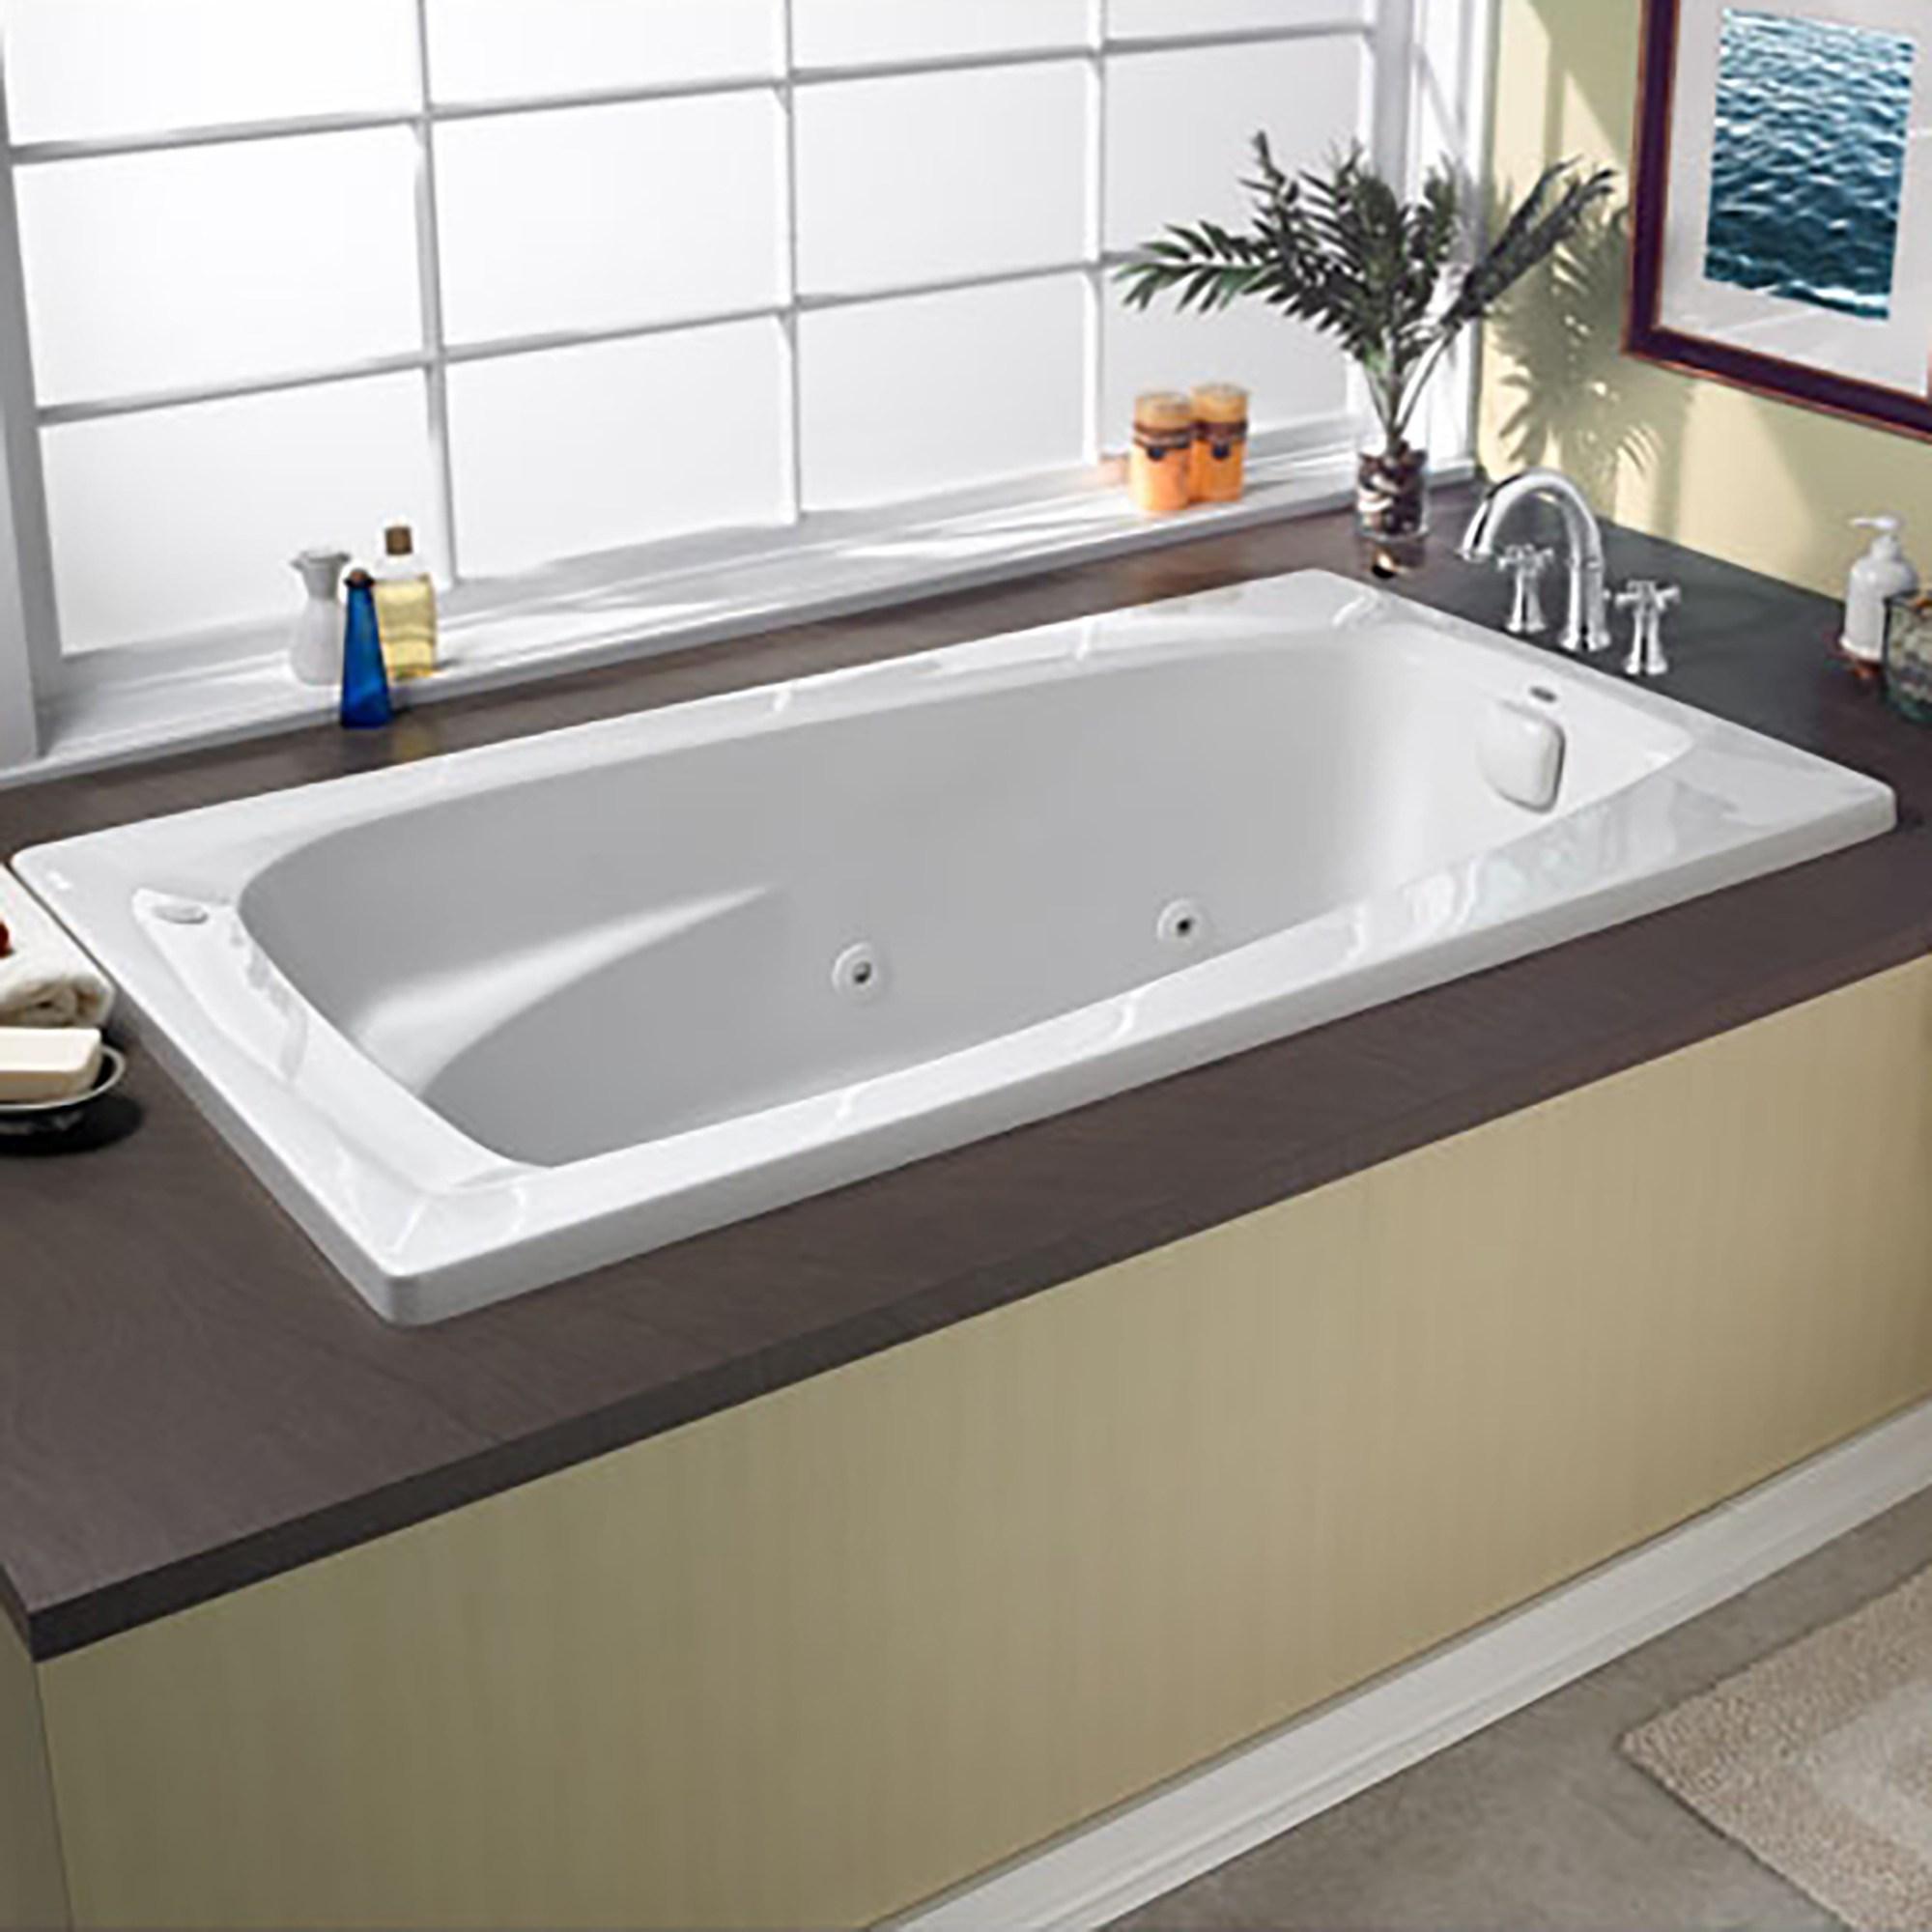 American Standard Whirlpool Bathtub Home Express Ltd